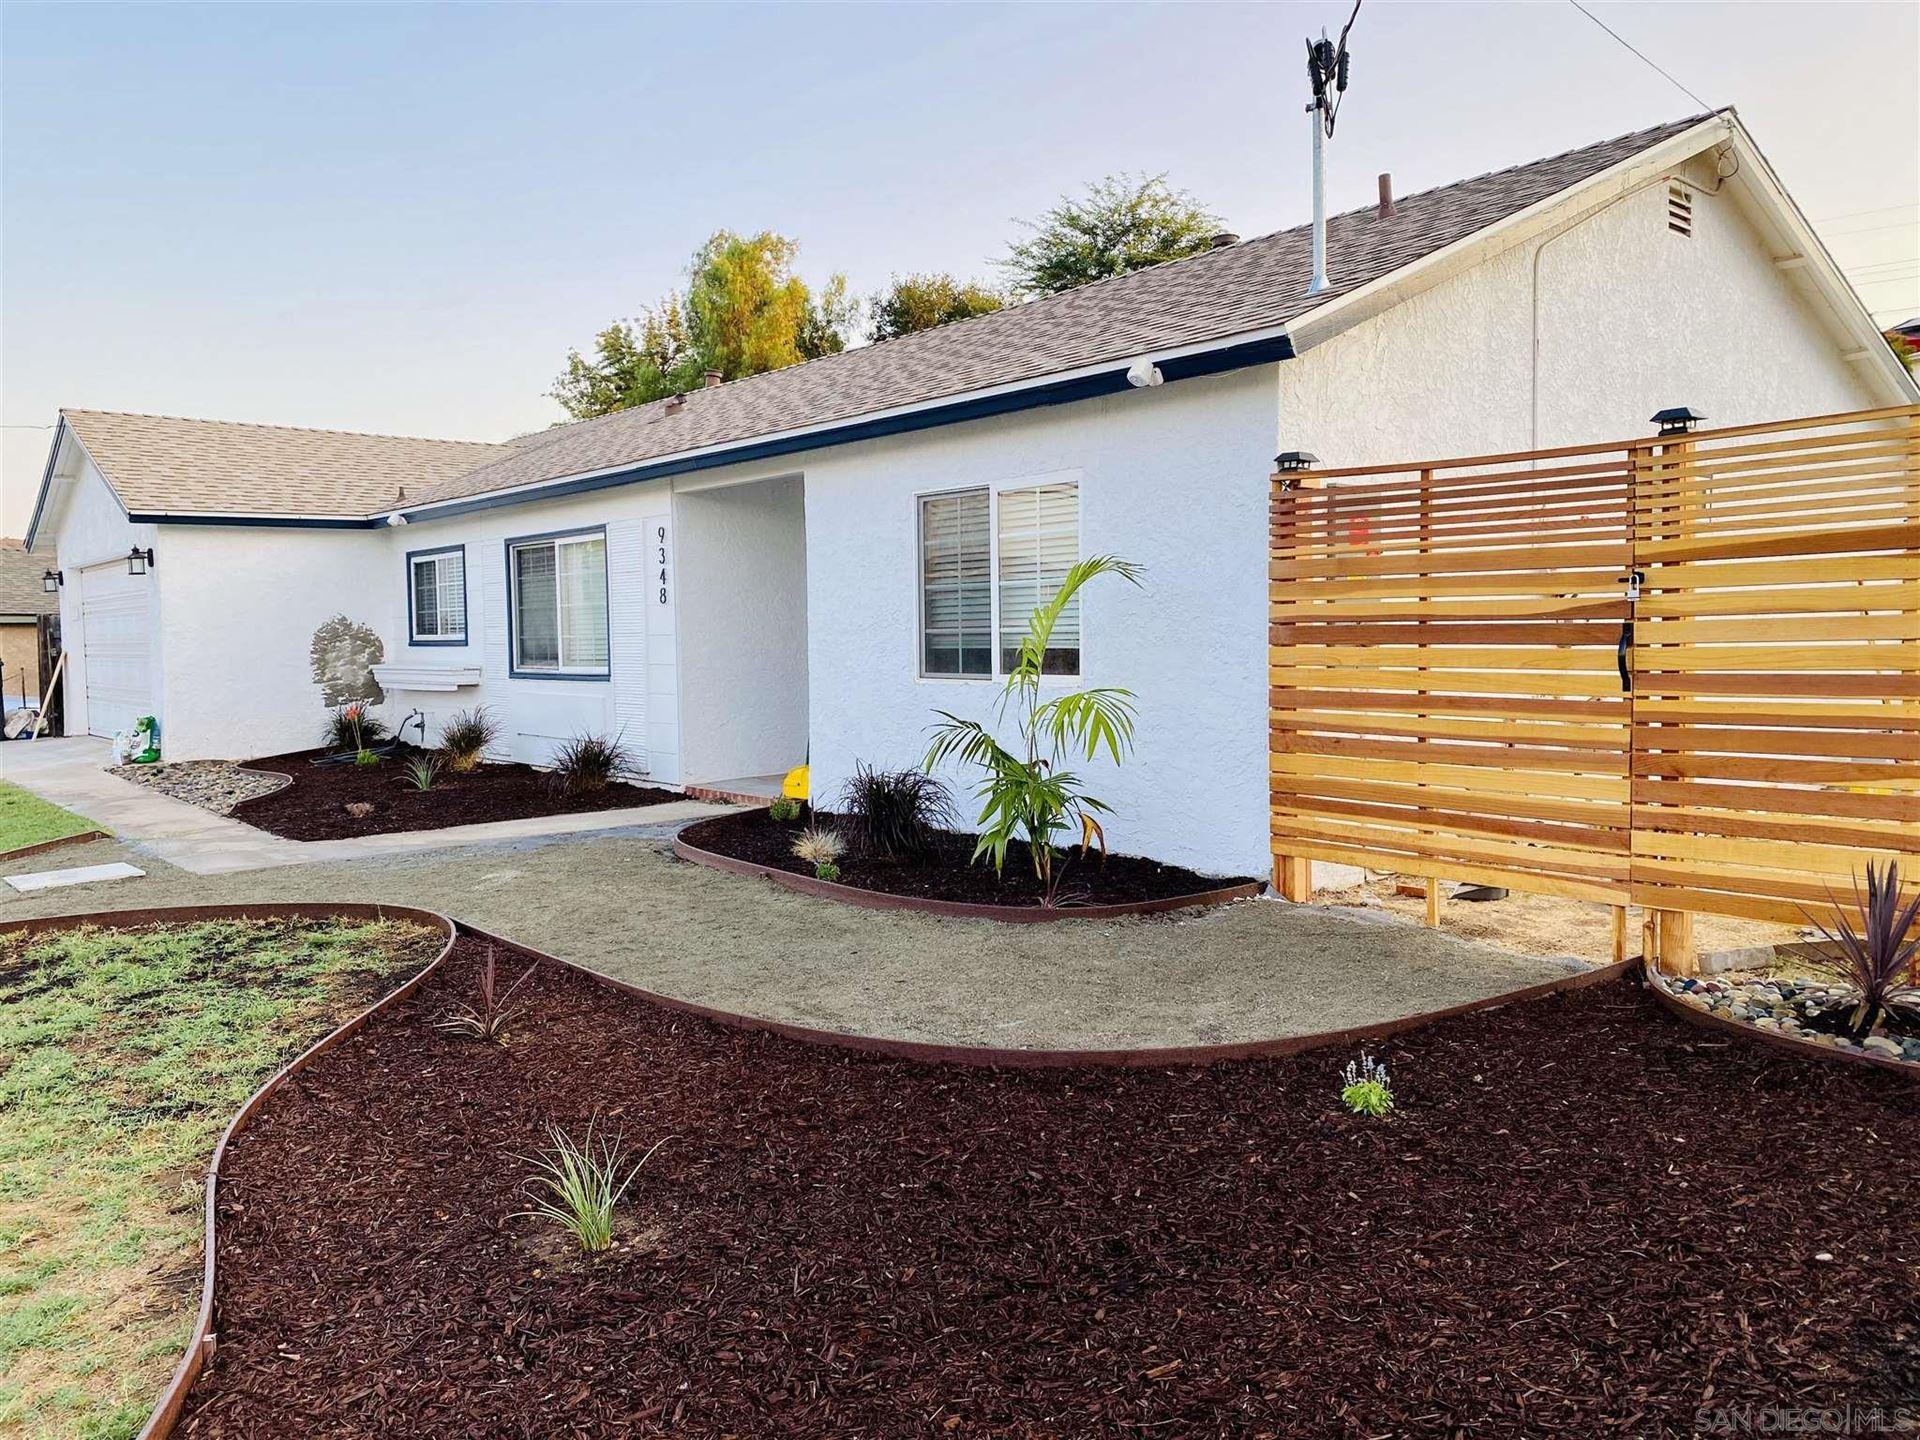 Photo of 9348 Pebble Beach Dr, Santee, CA 92071 (MLS # 210021043)